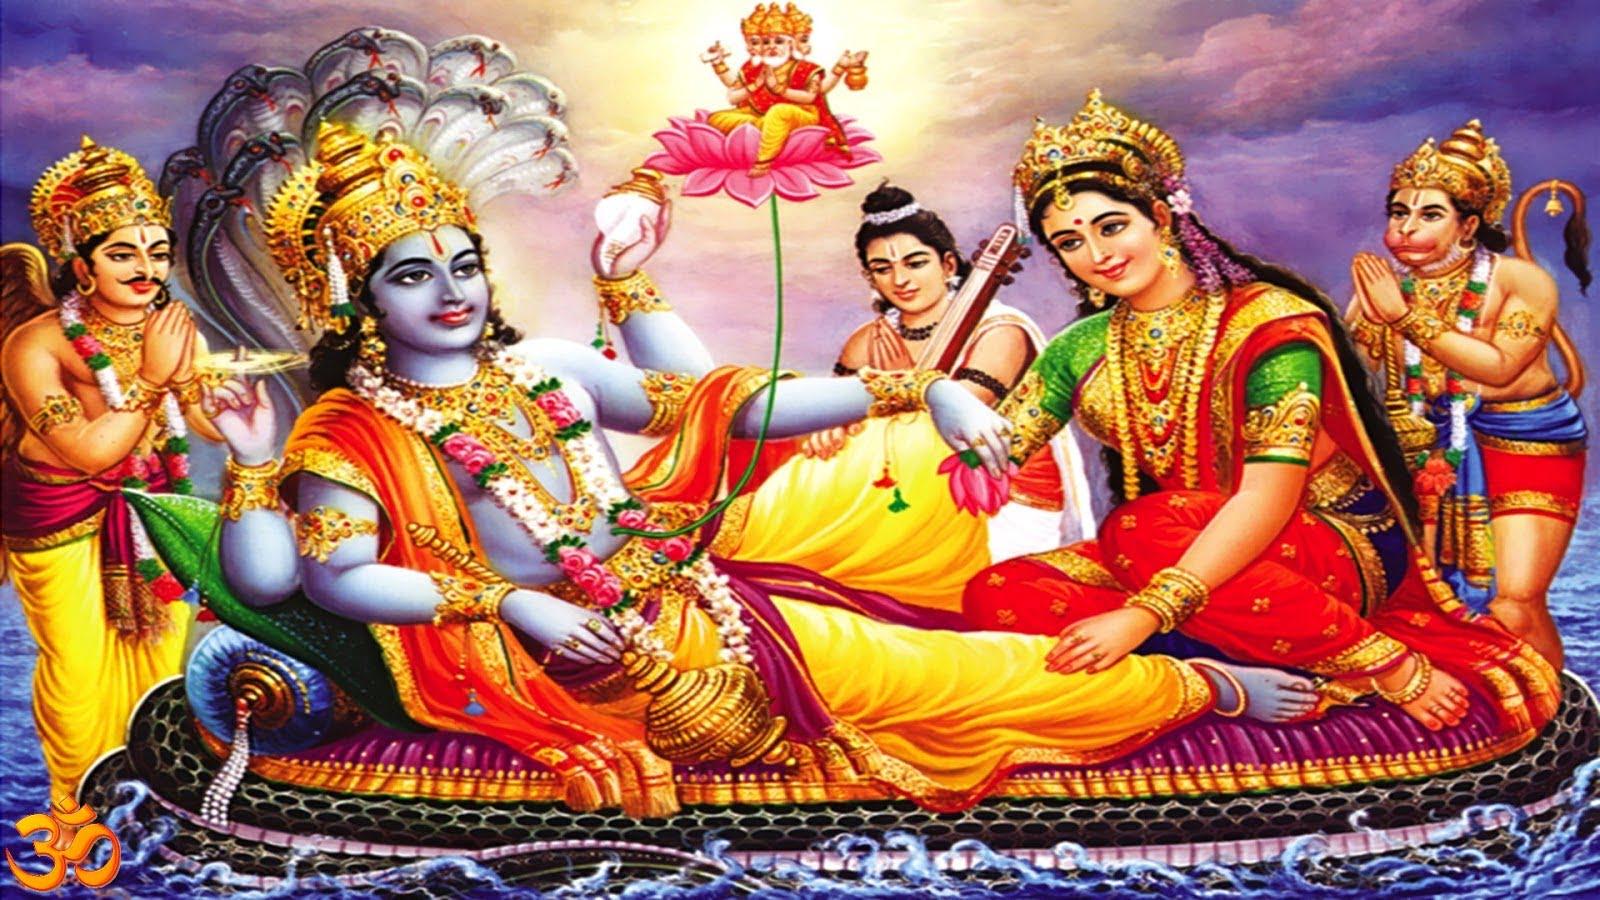 24 Avatars (Incarnations) of Lord Vishnu, Hindi, Story, Kahani, Katha,